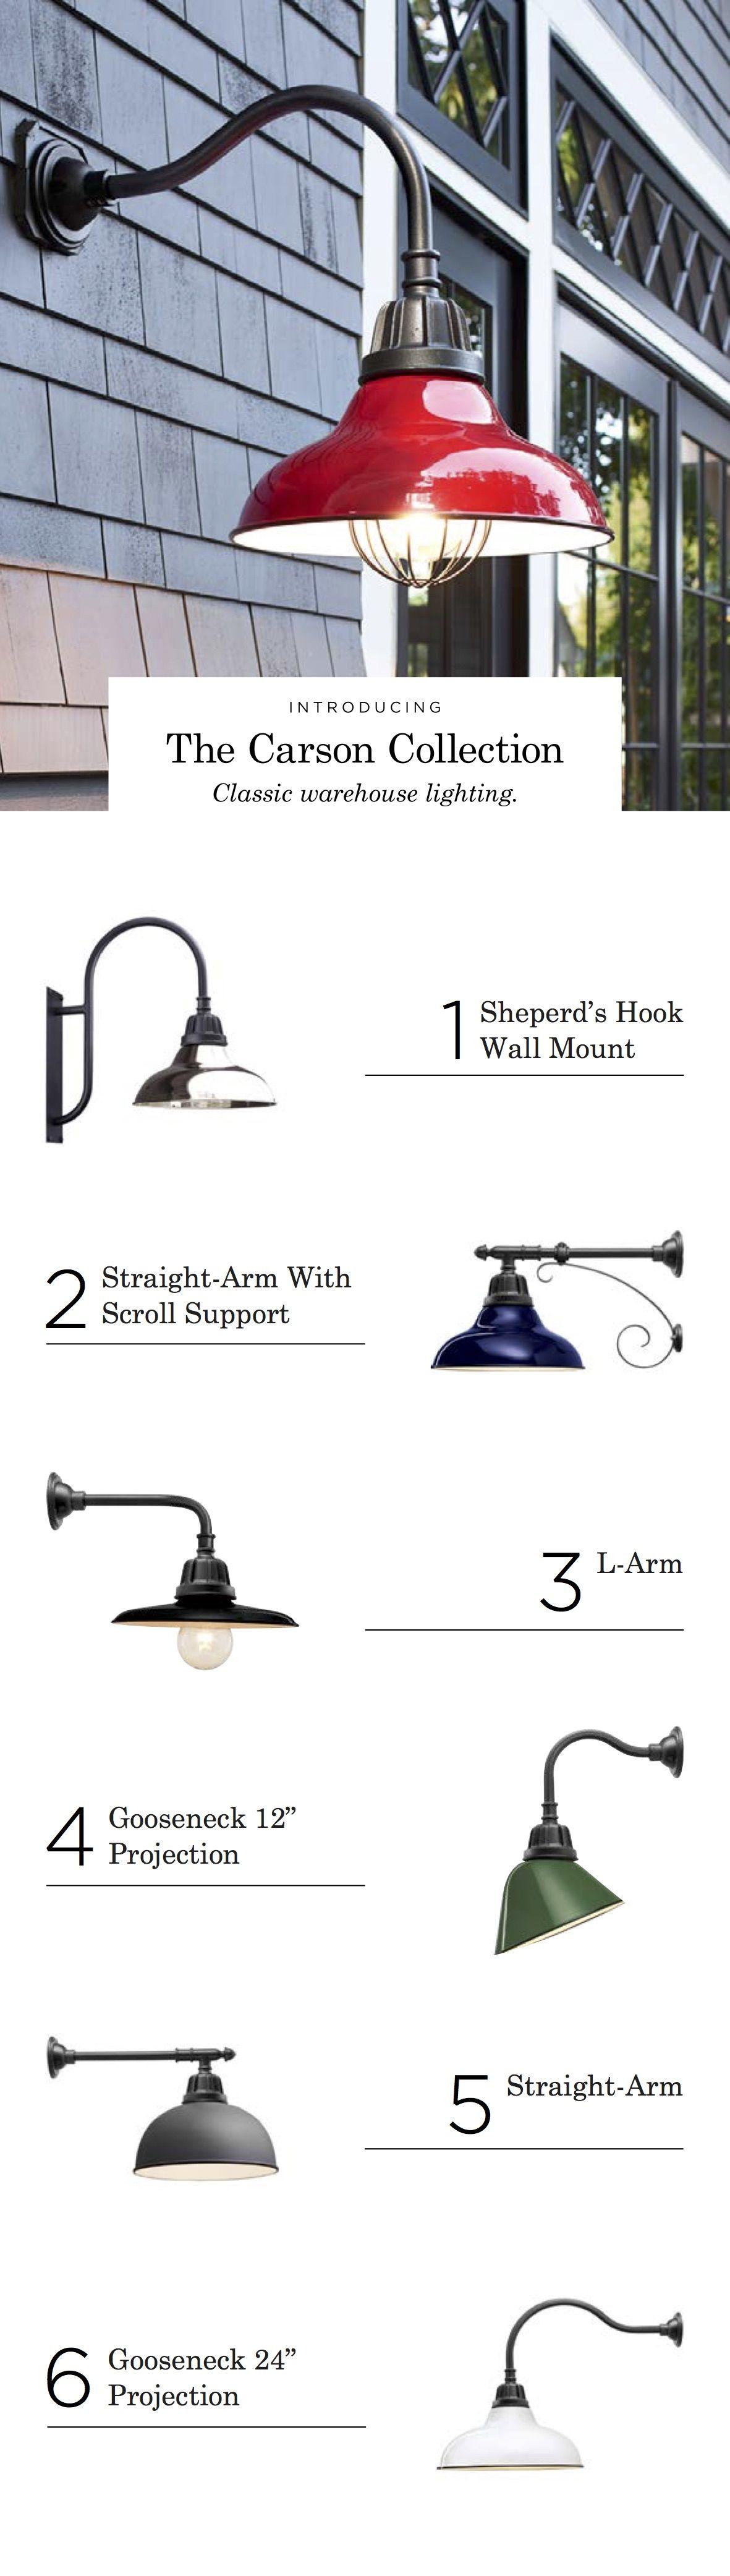 Carson gooseneck sconce warehouse fixtures outdoor lighting different types of fixtures arubaitofo Choice Image